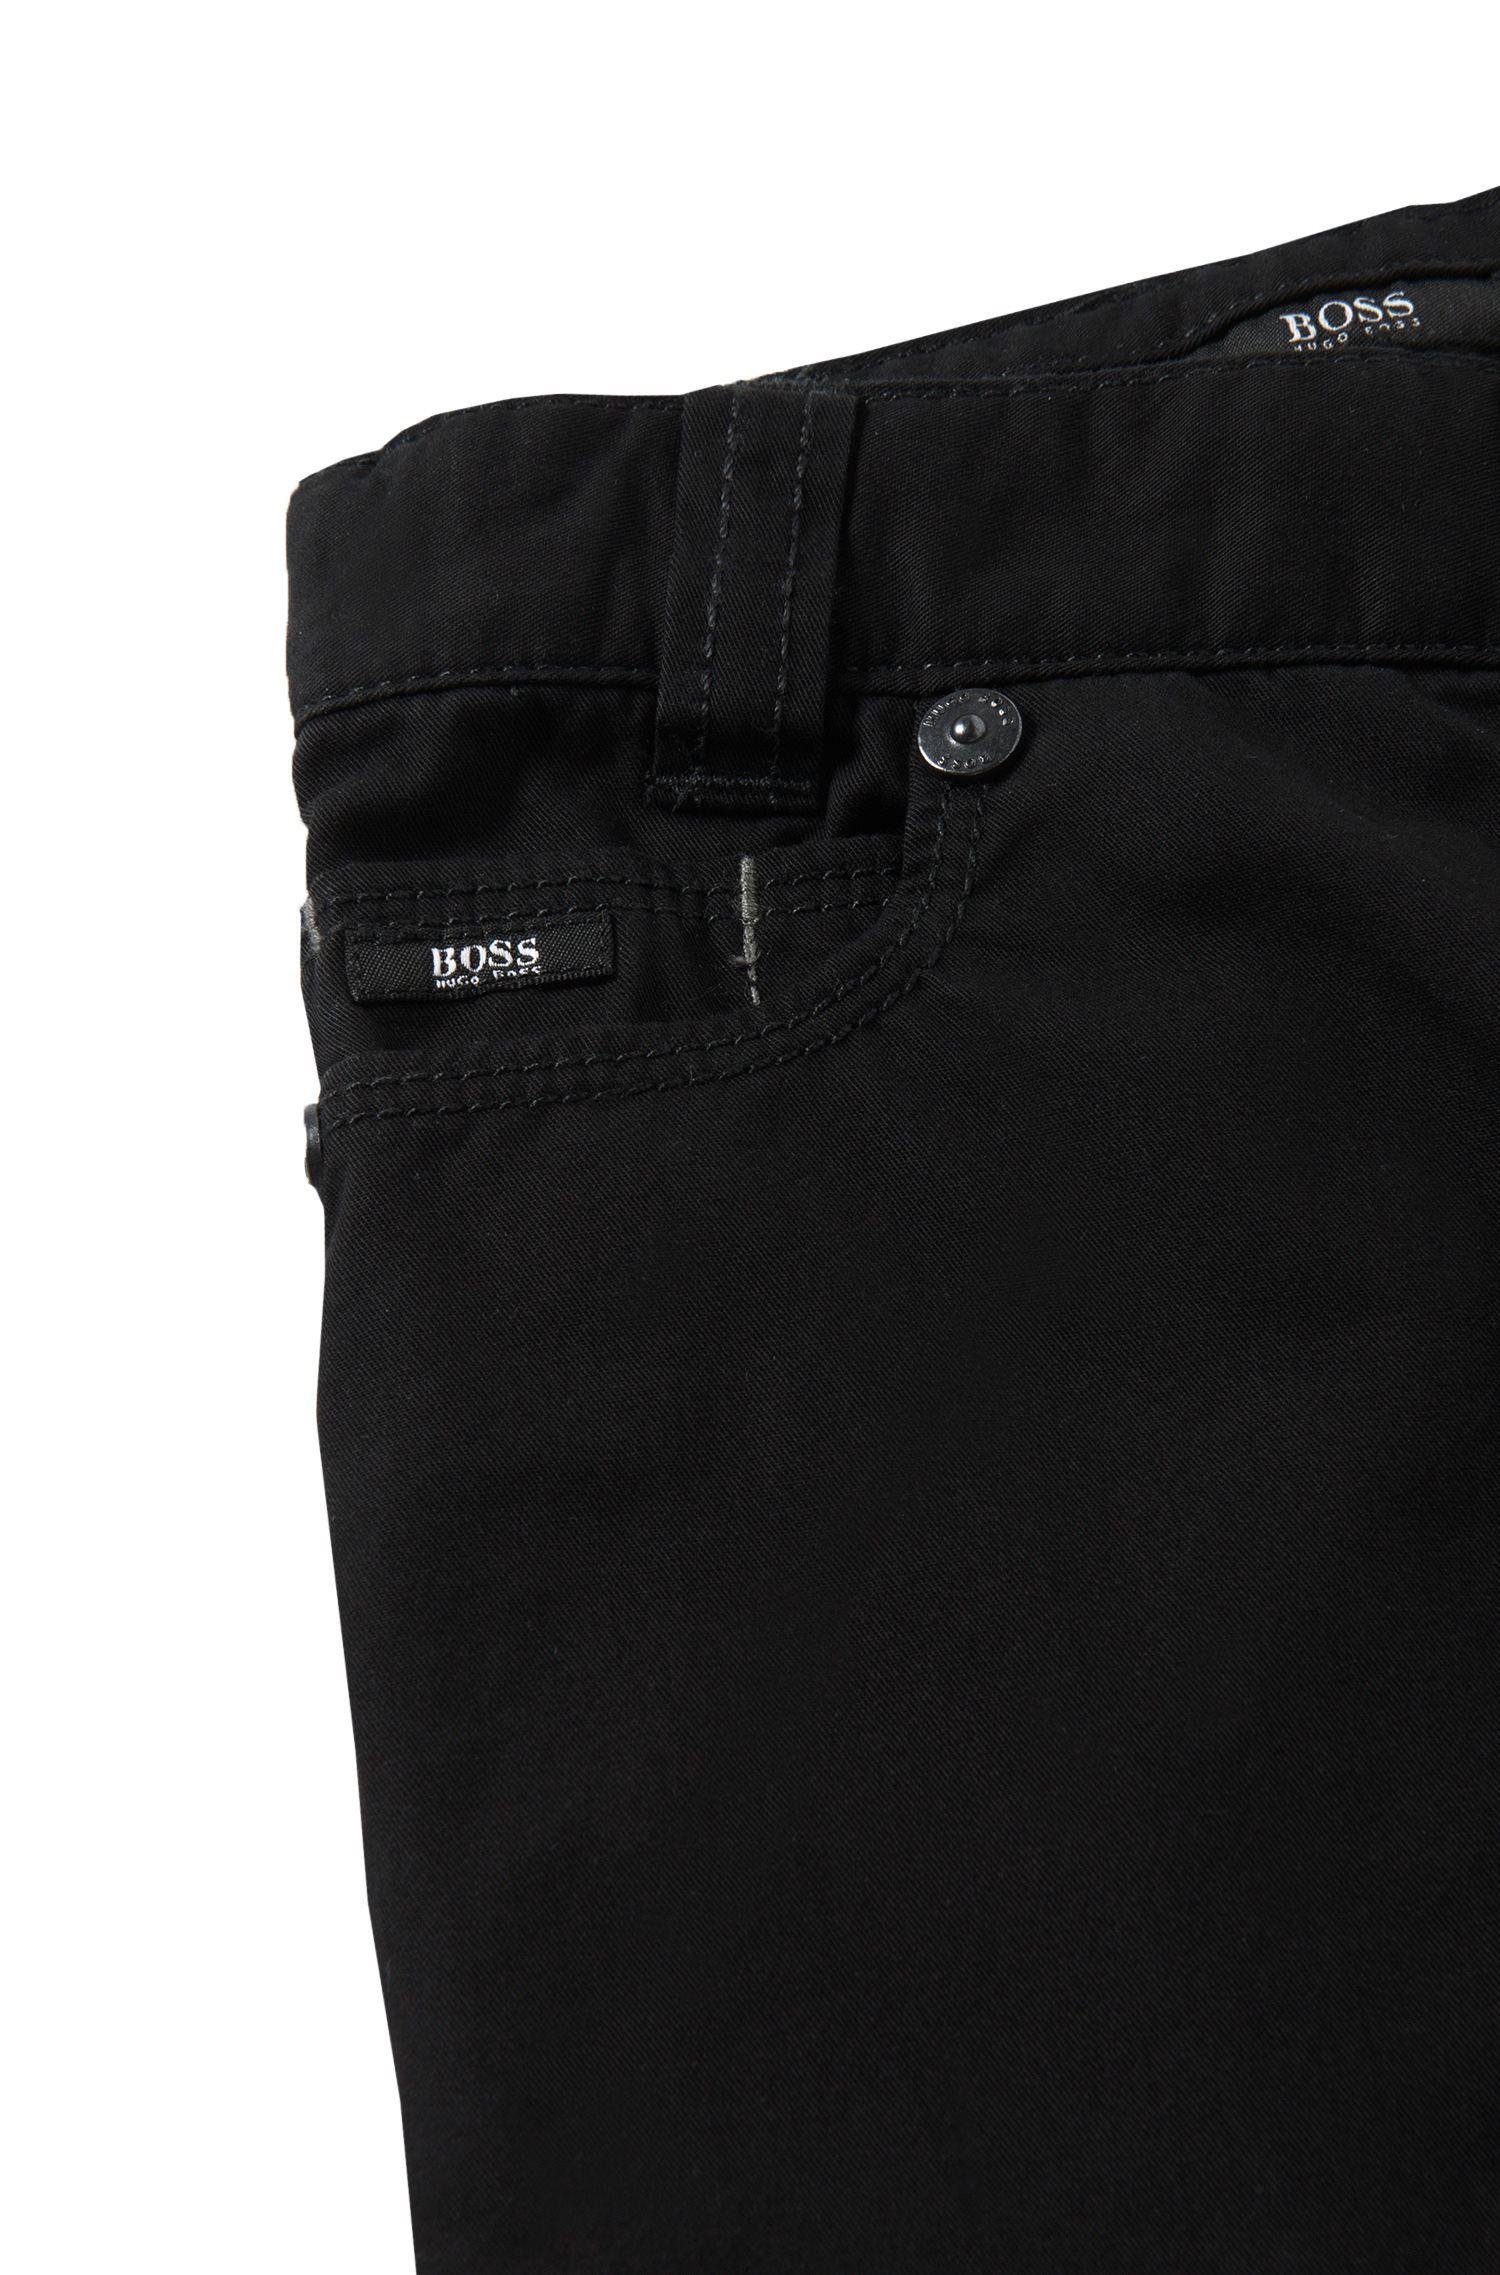 'J24393' | Boys Stretch Cotton Twill Pants, Black